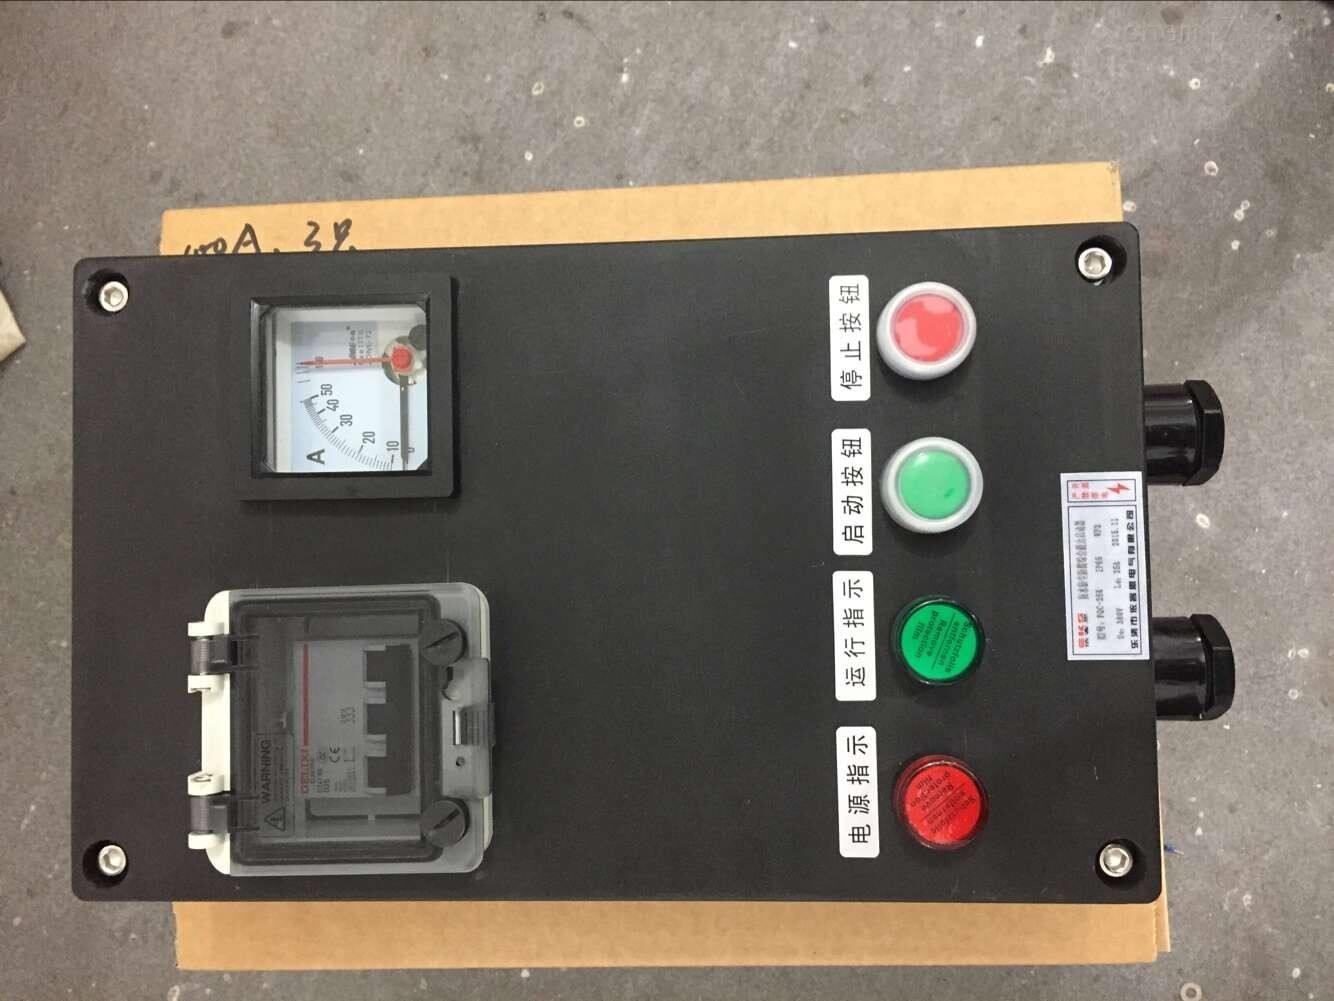 SFQC-12N三防电磁起动器厂家 SFQC-12N全塑三防电磁起动器价格